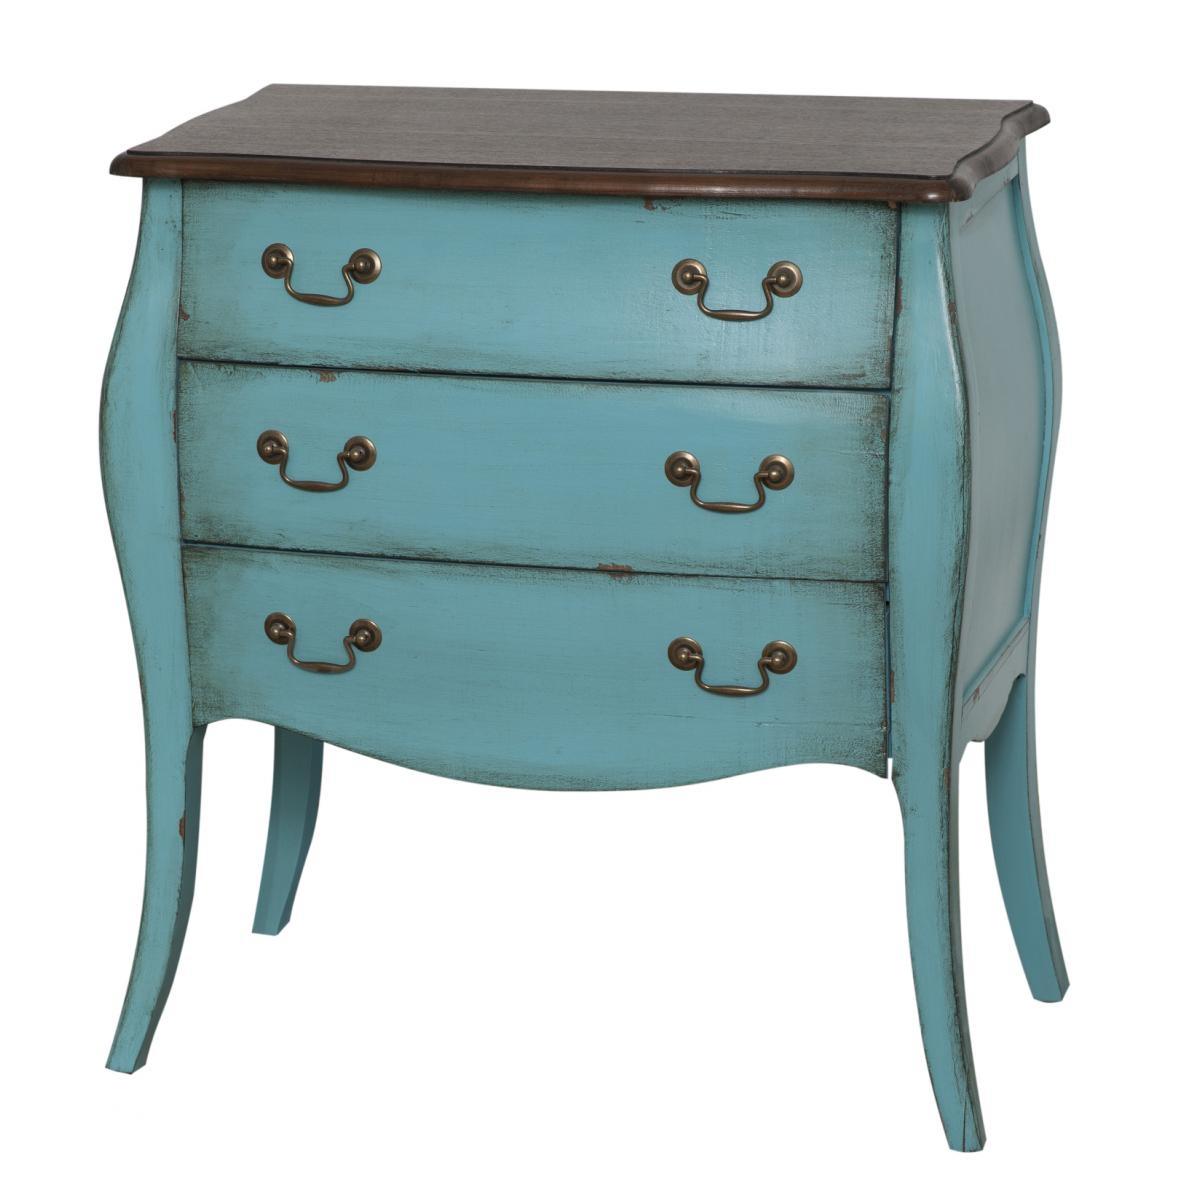 Cabinet din lemn de plop, furnir si MDF, cu 3 sertare Mellow Medium Turquoise / Brown, l69xA39xH77 cm